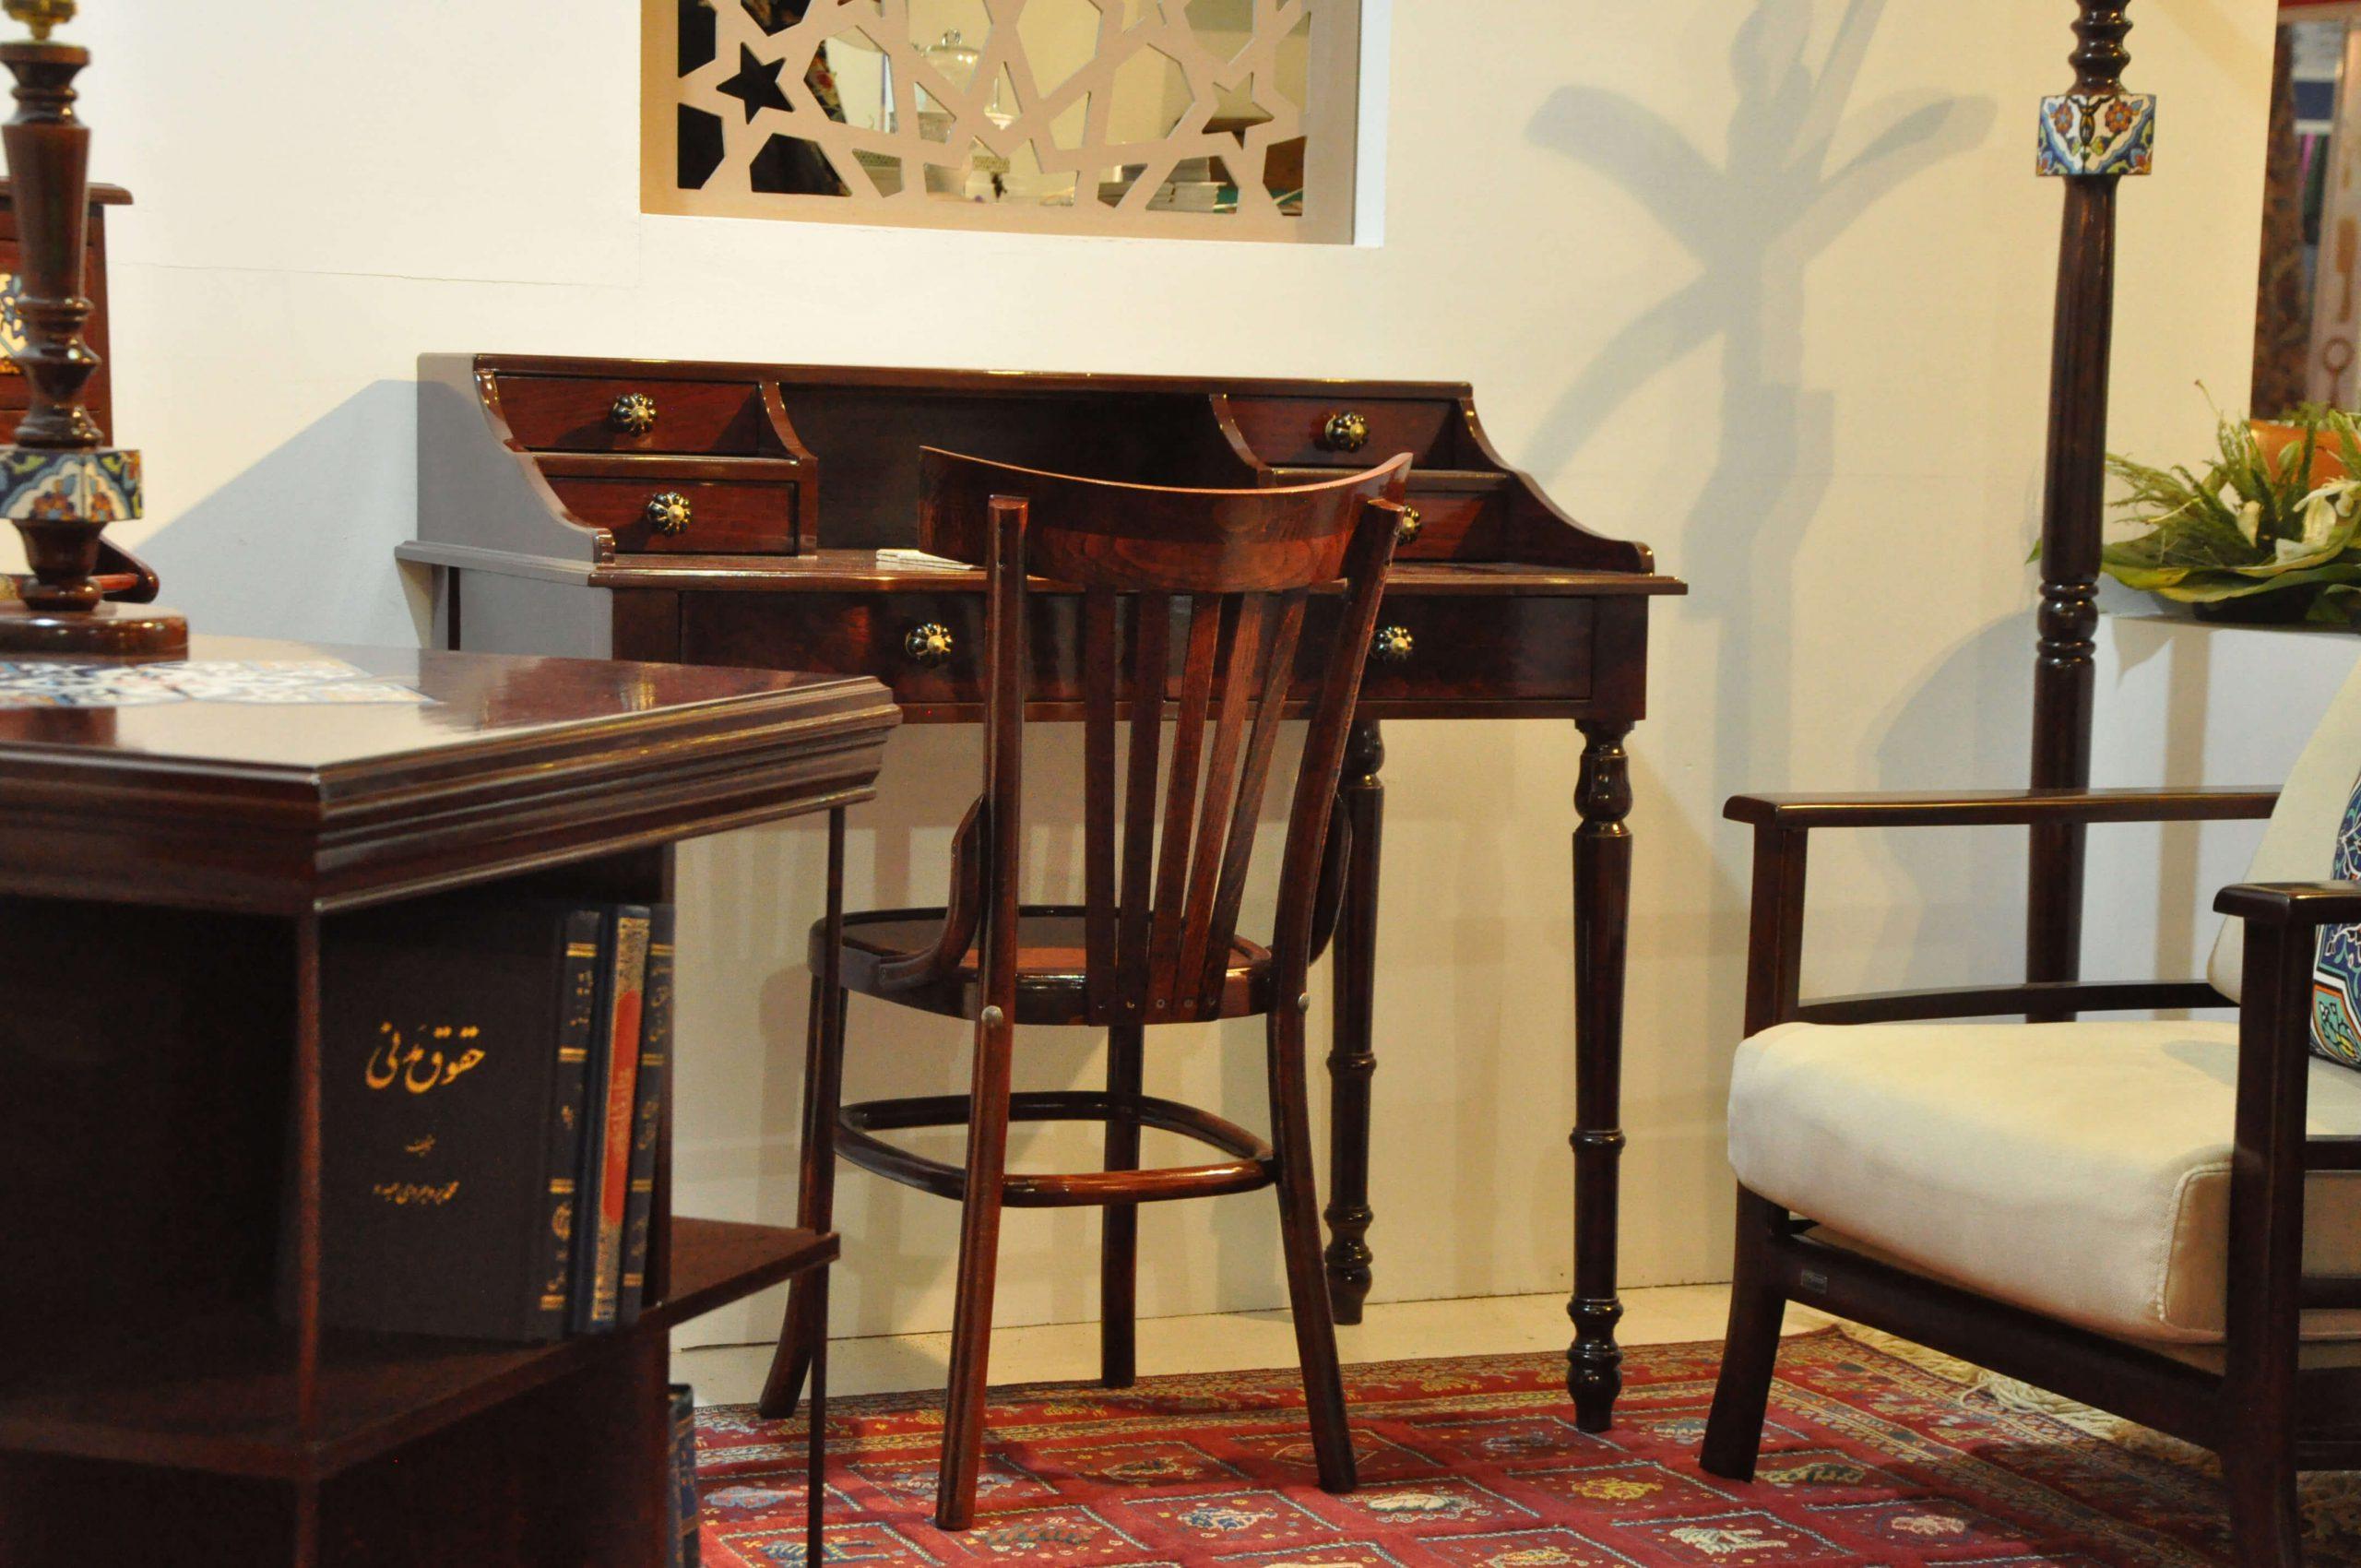 00000000 scaled - میز تحریر و صندلی طرح لهستانی -  - writing-desks